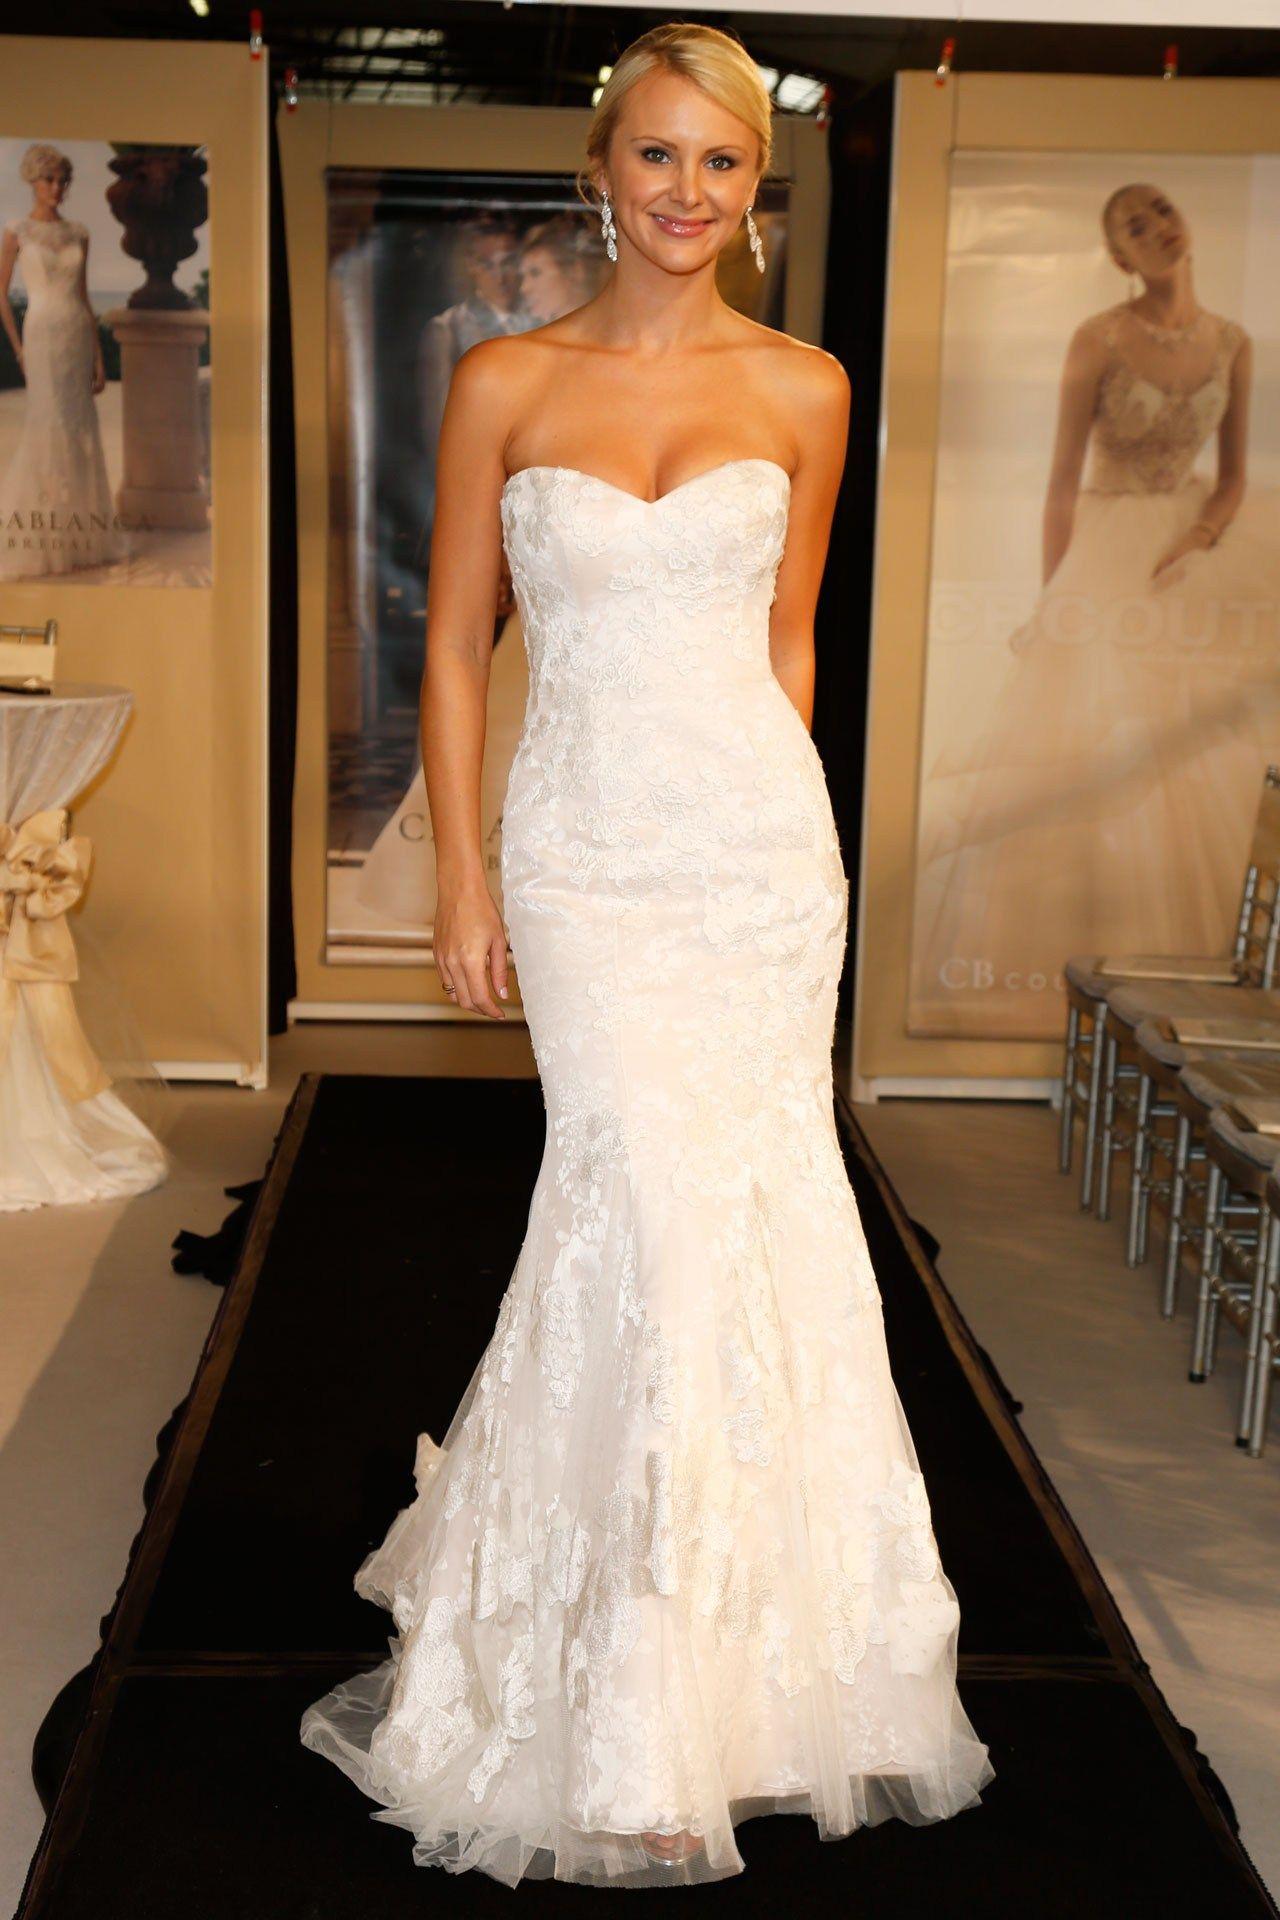 Wedding Dresses The Ultimate Gallery (BridesMagazine.co